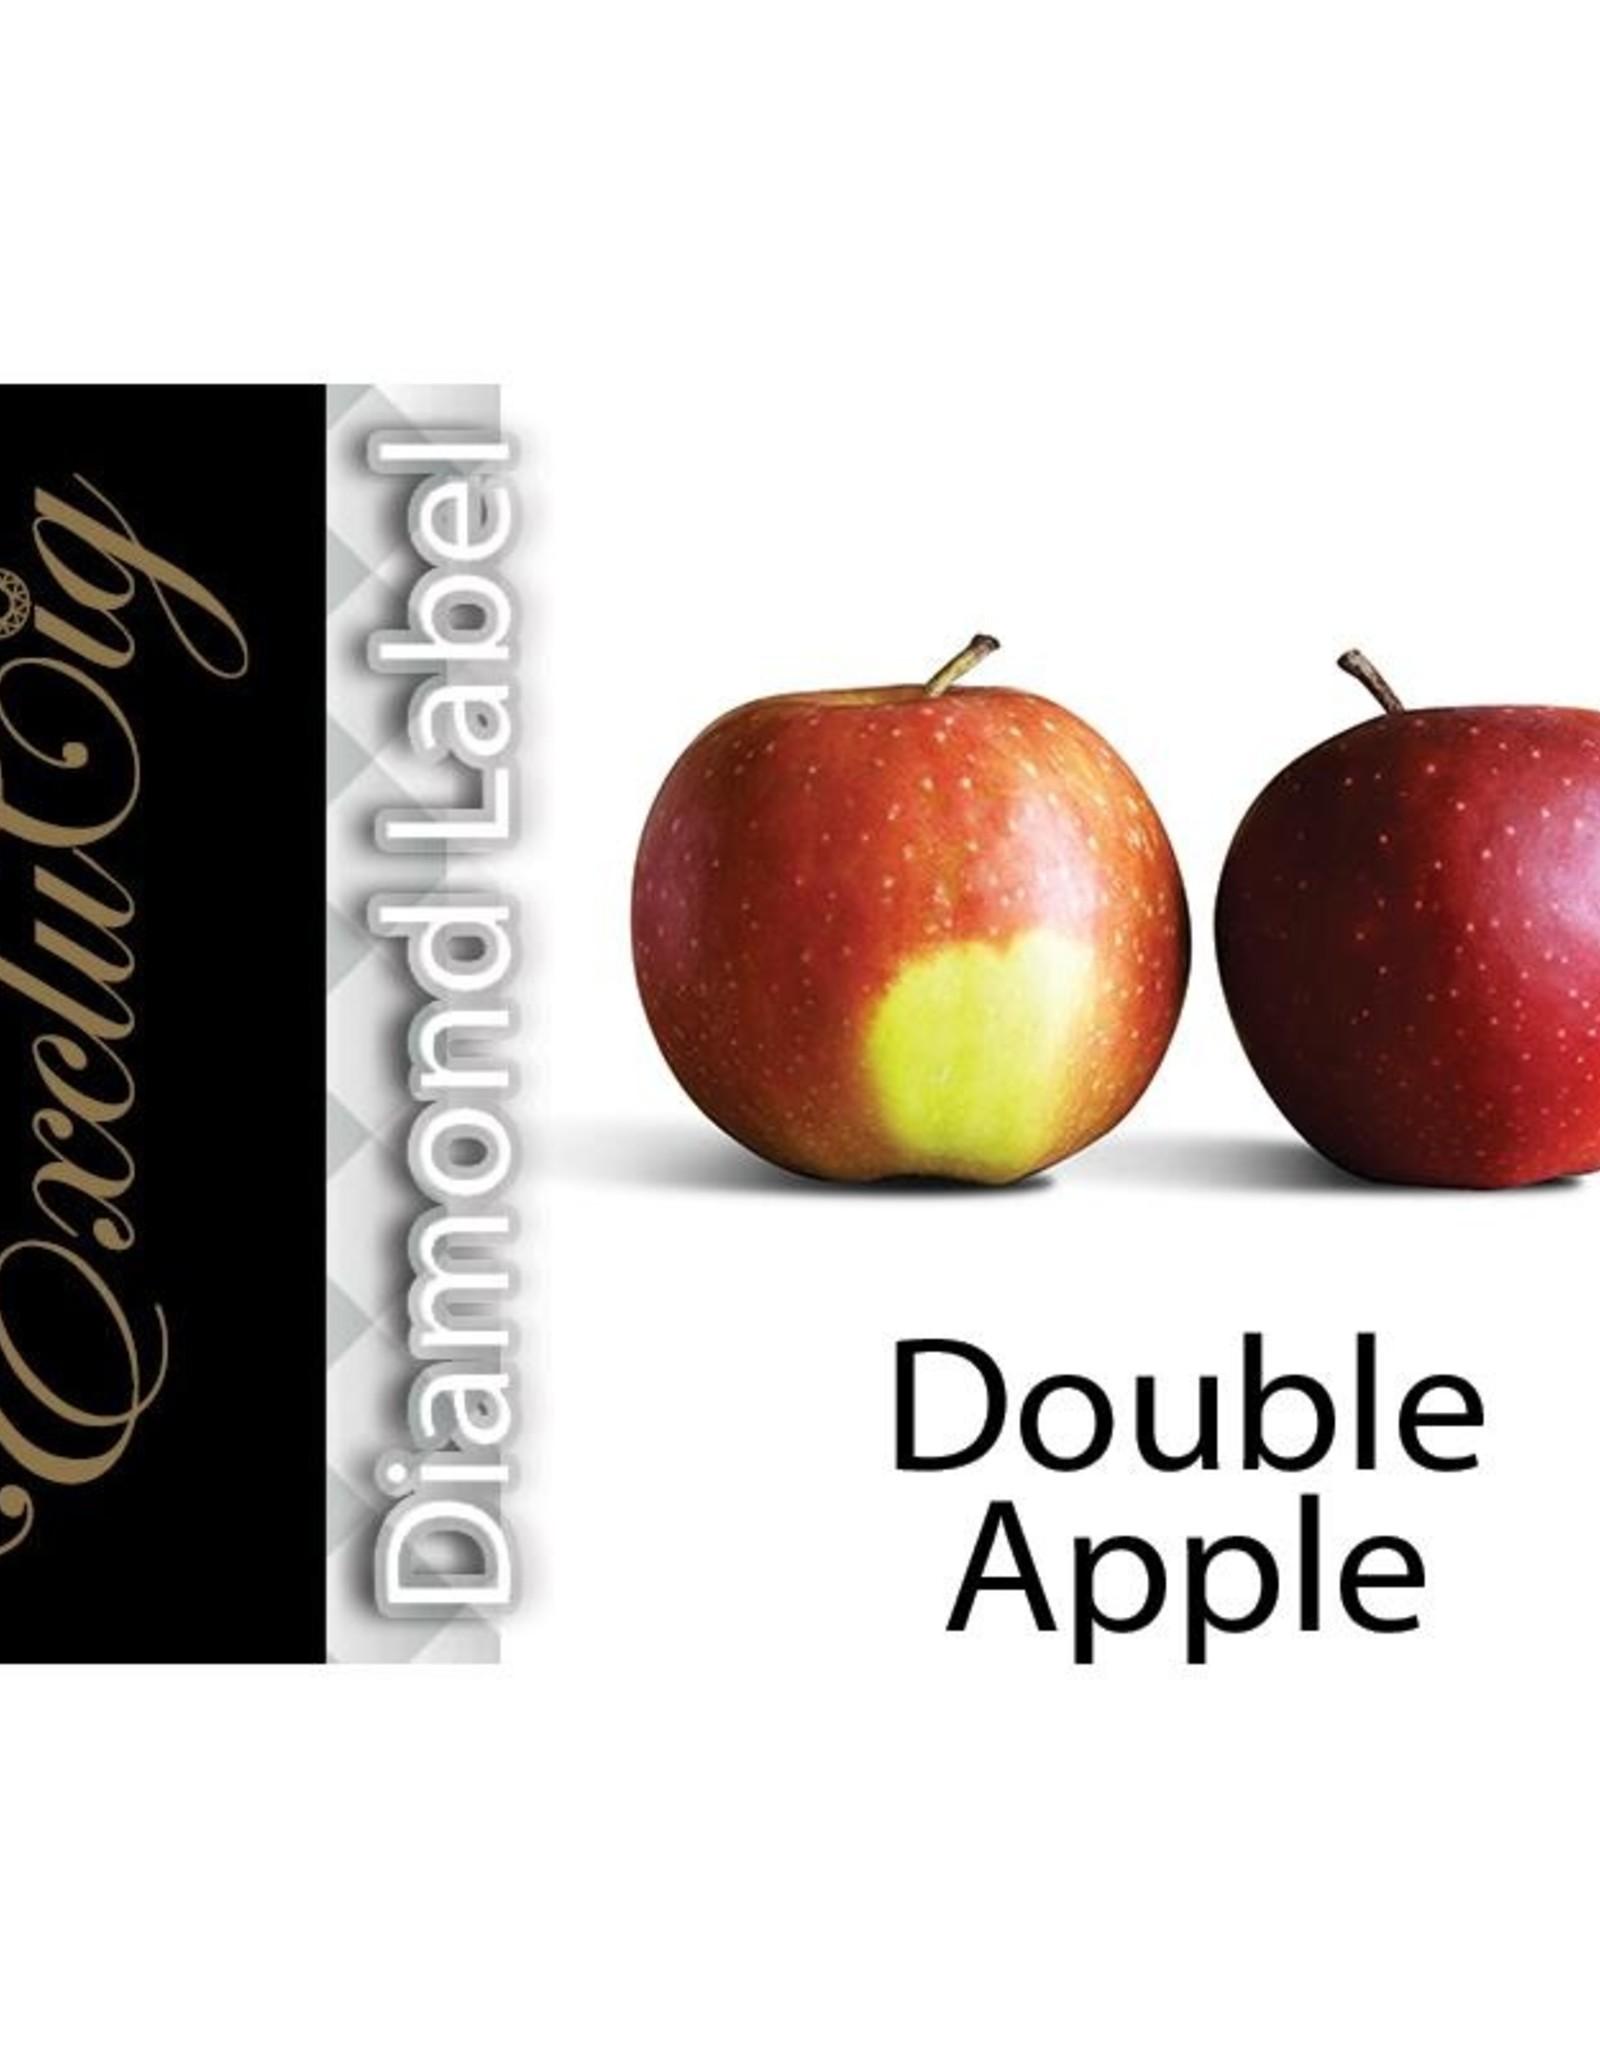 Exclucig Exclucig Diamond Label E-liquid Double Apple 18 mg Nicotine